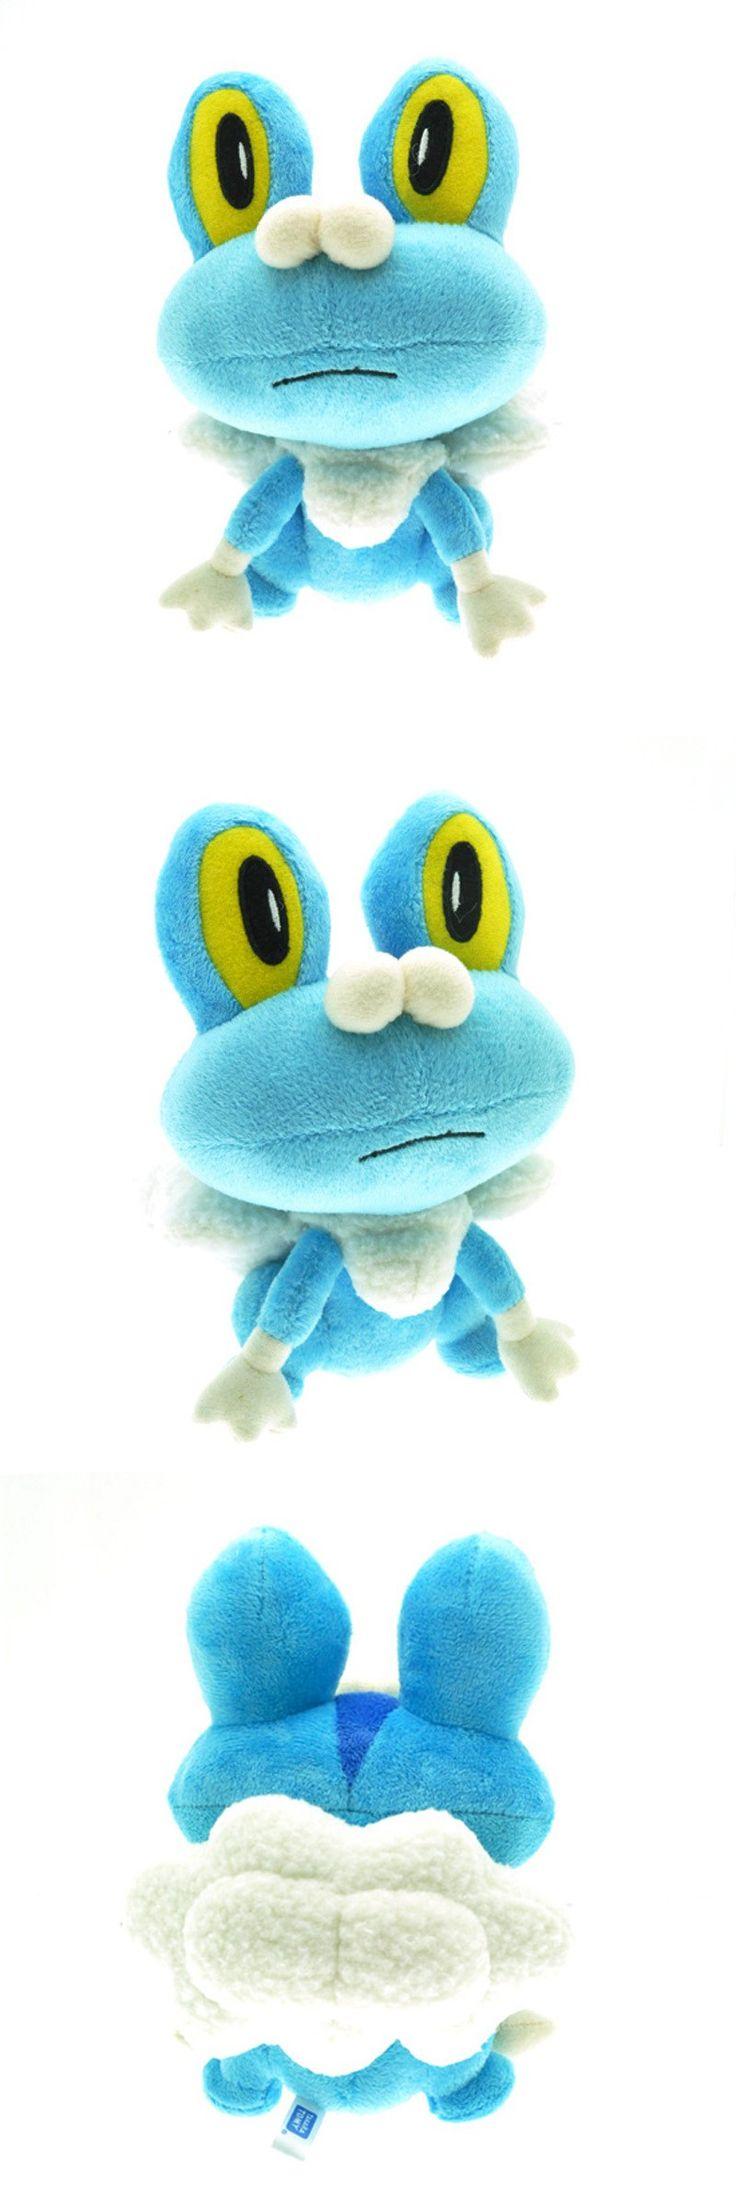 Newest Pokemon XY Froakie Plush Toy Dolls Kawaii 18cm Frogs Froakie Game Plush Toy Soft Stuffed Animals Toys Doll Gift for Kids $5.99